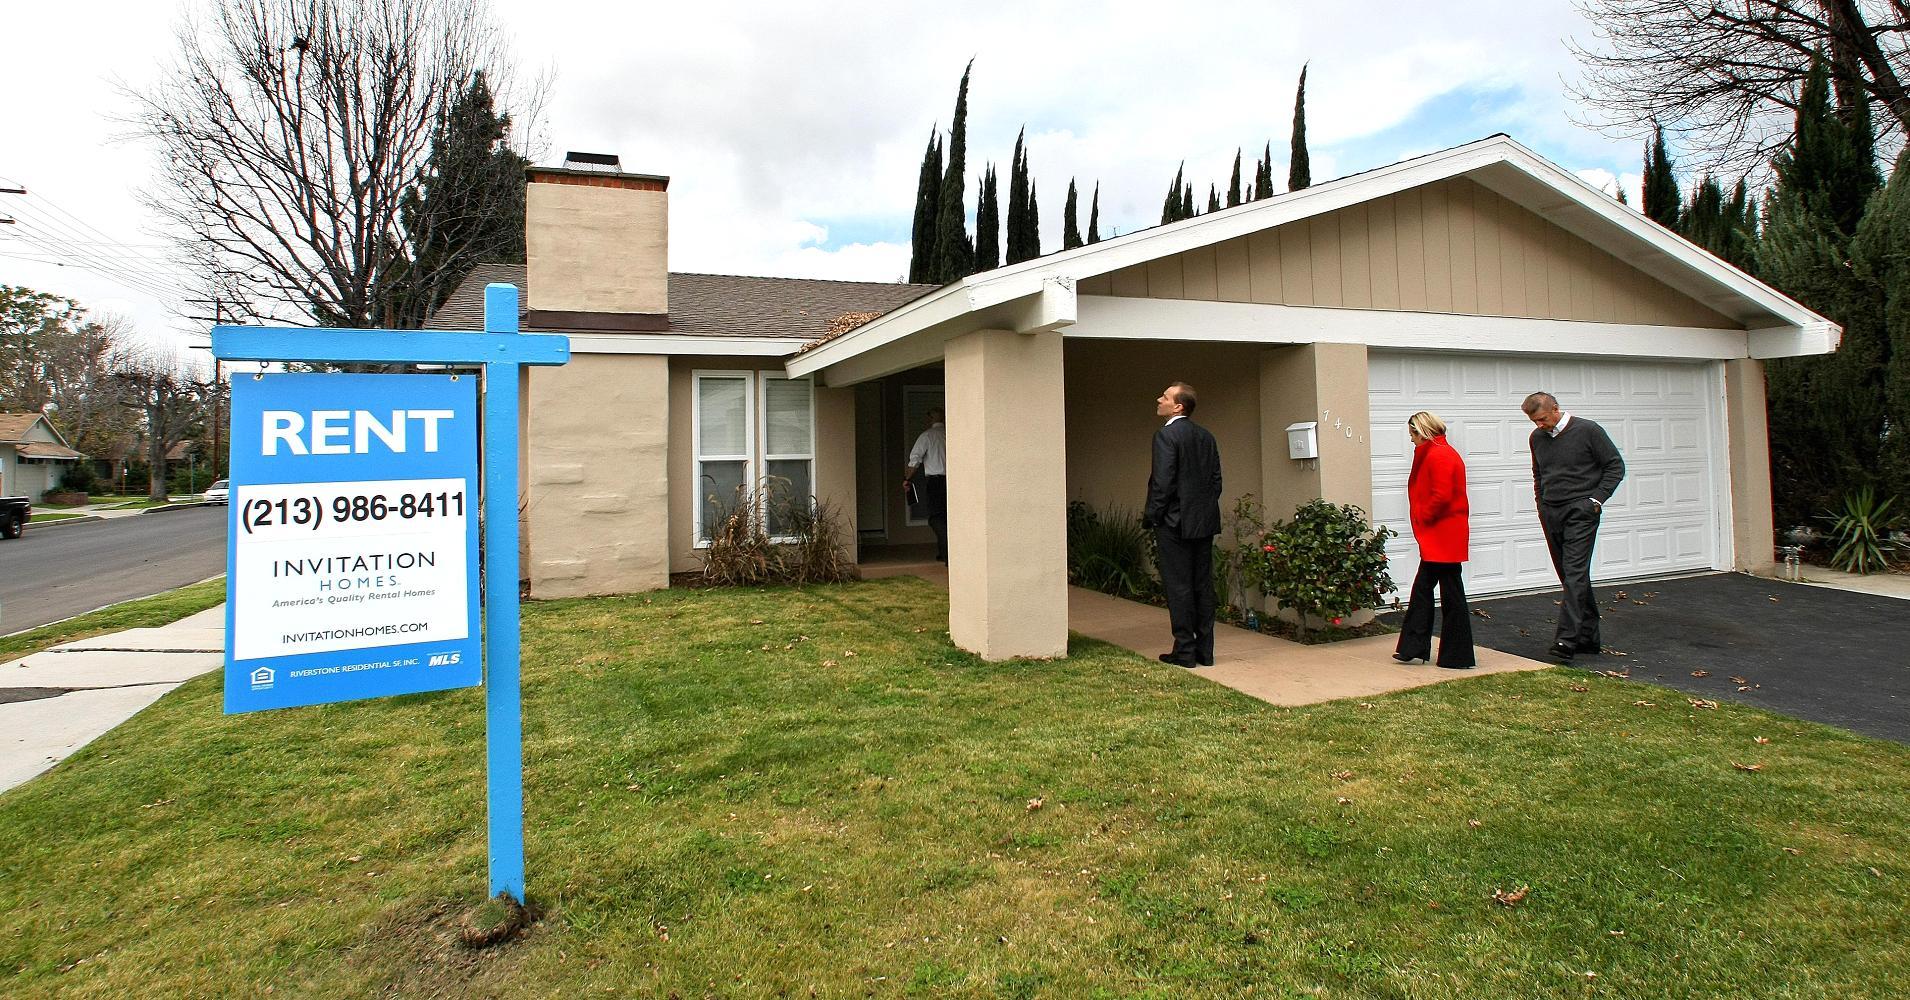 Blackstone's Invitation Homes to buy Starwood Waypoint, creating a $11B single-family rental company